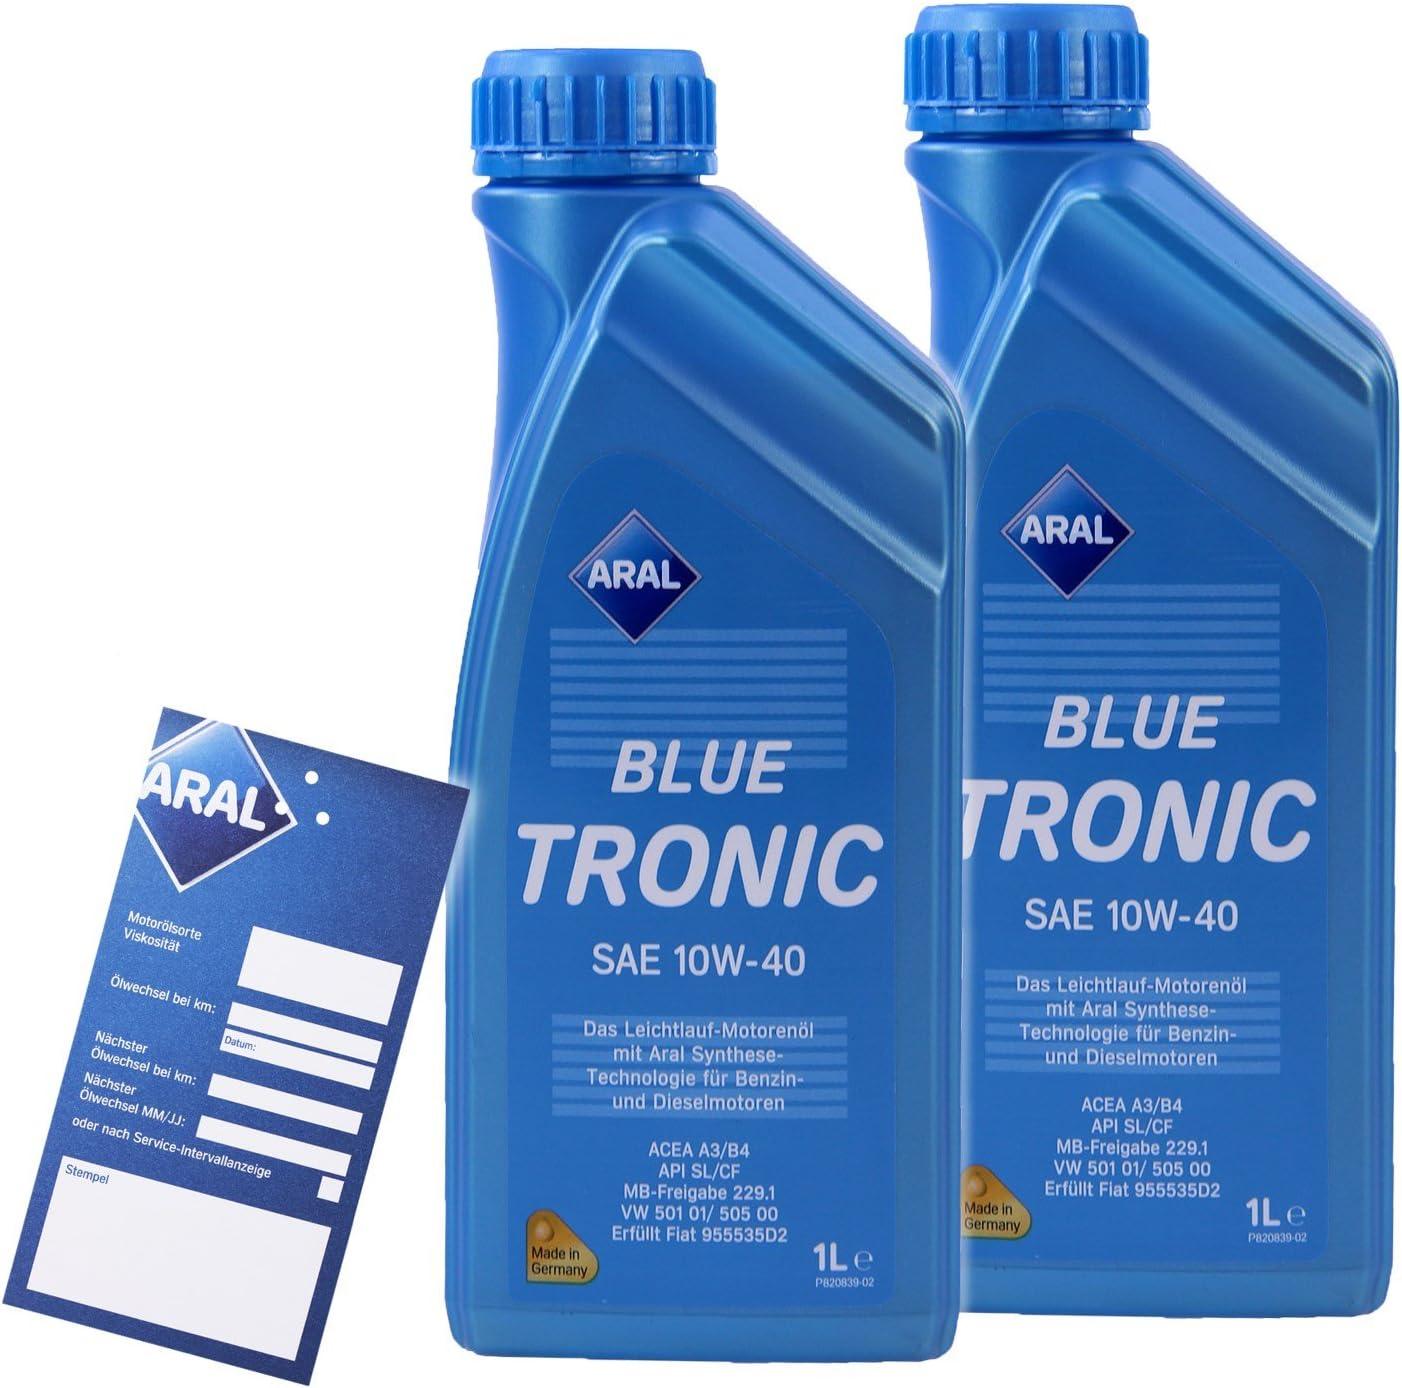 2x 1 L Liter Aral Bluetronic Blue Tronic 10w 40 Motor Öl Motoren Öl 32005355 Auto